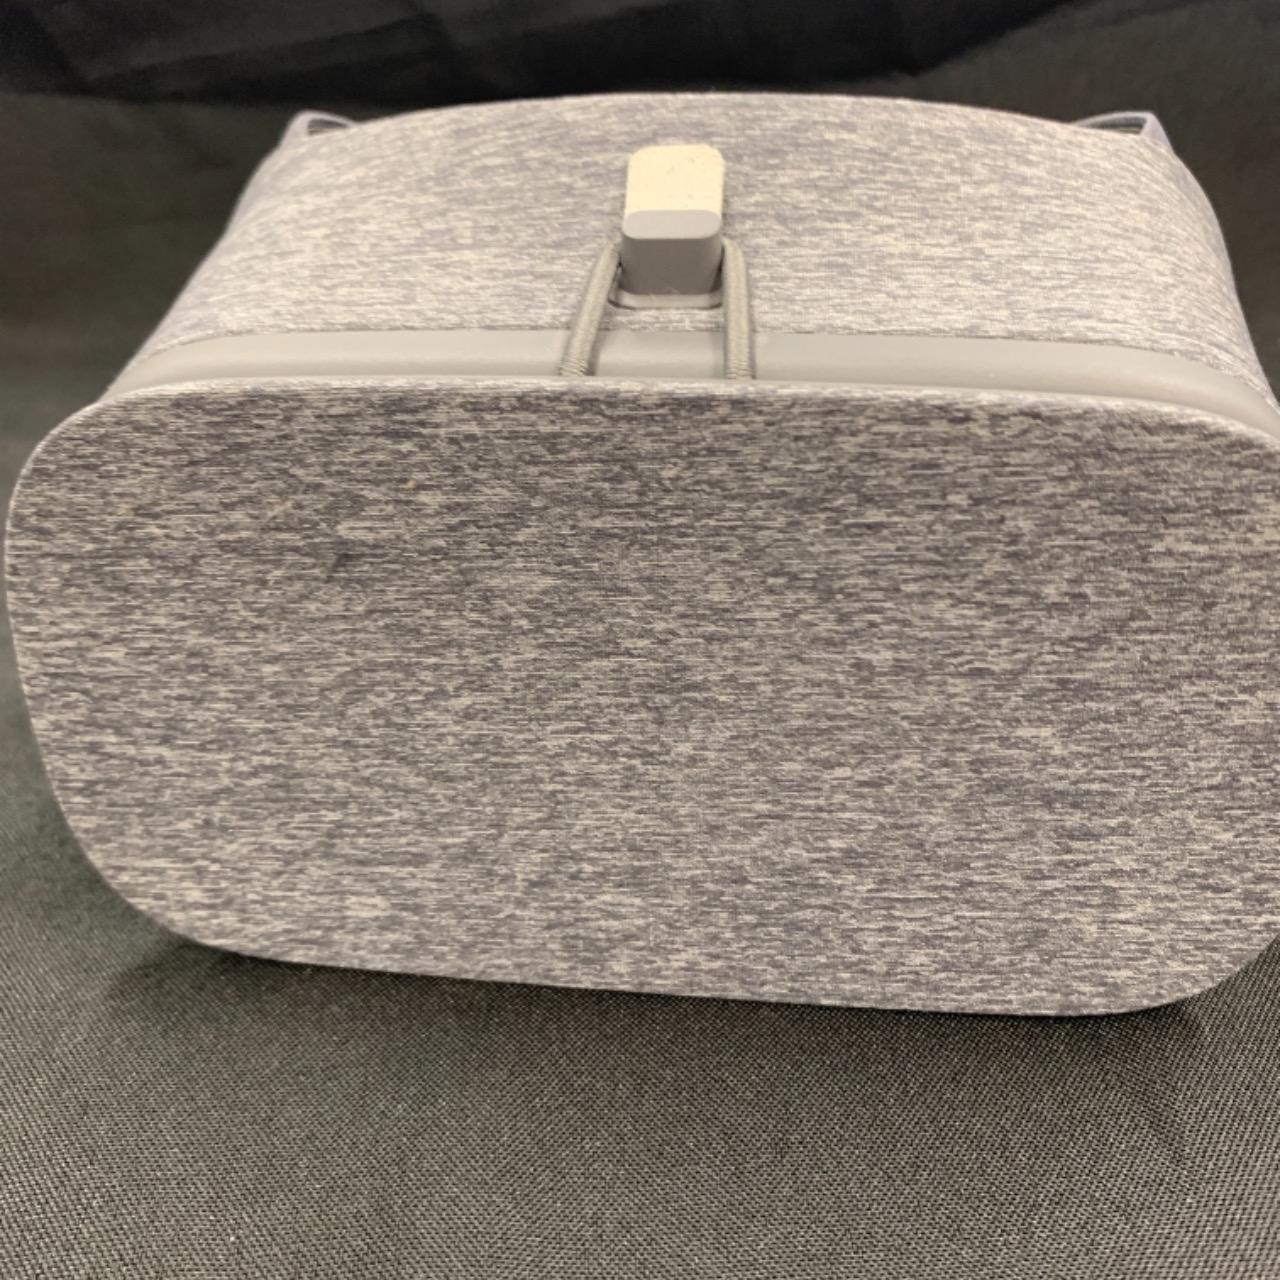 Google Day Dream VR headset